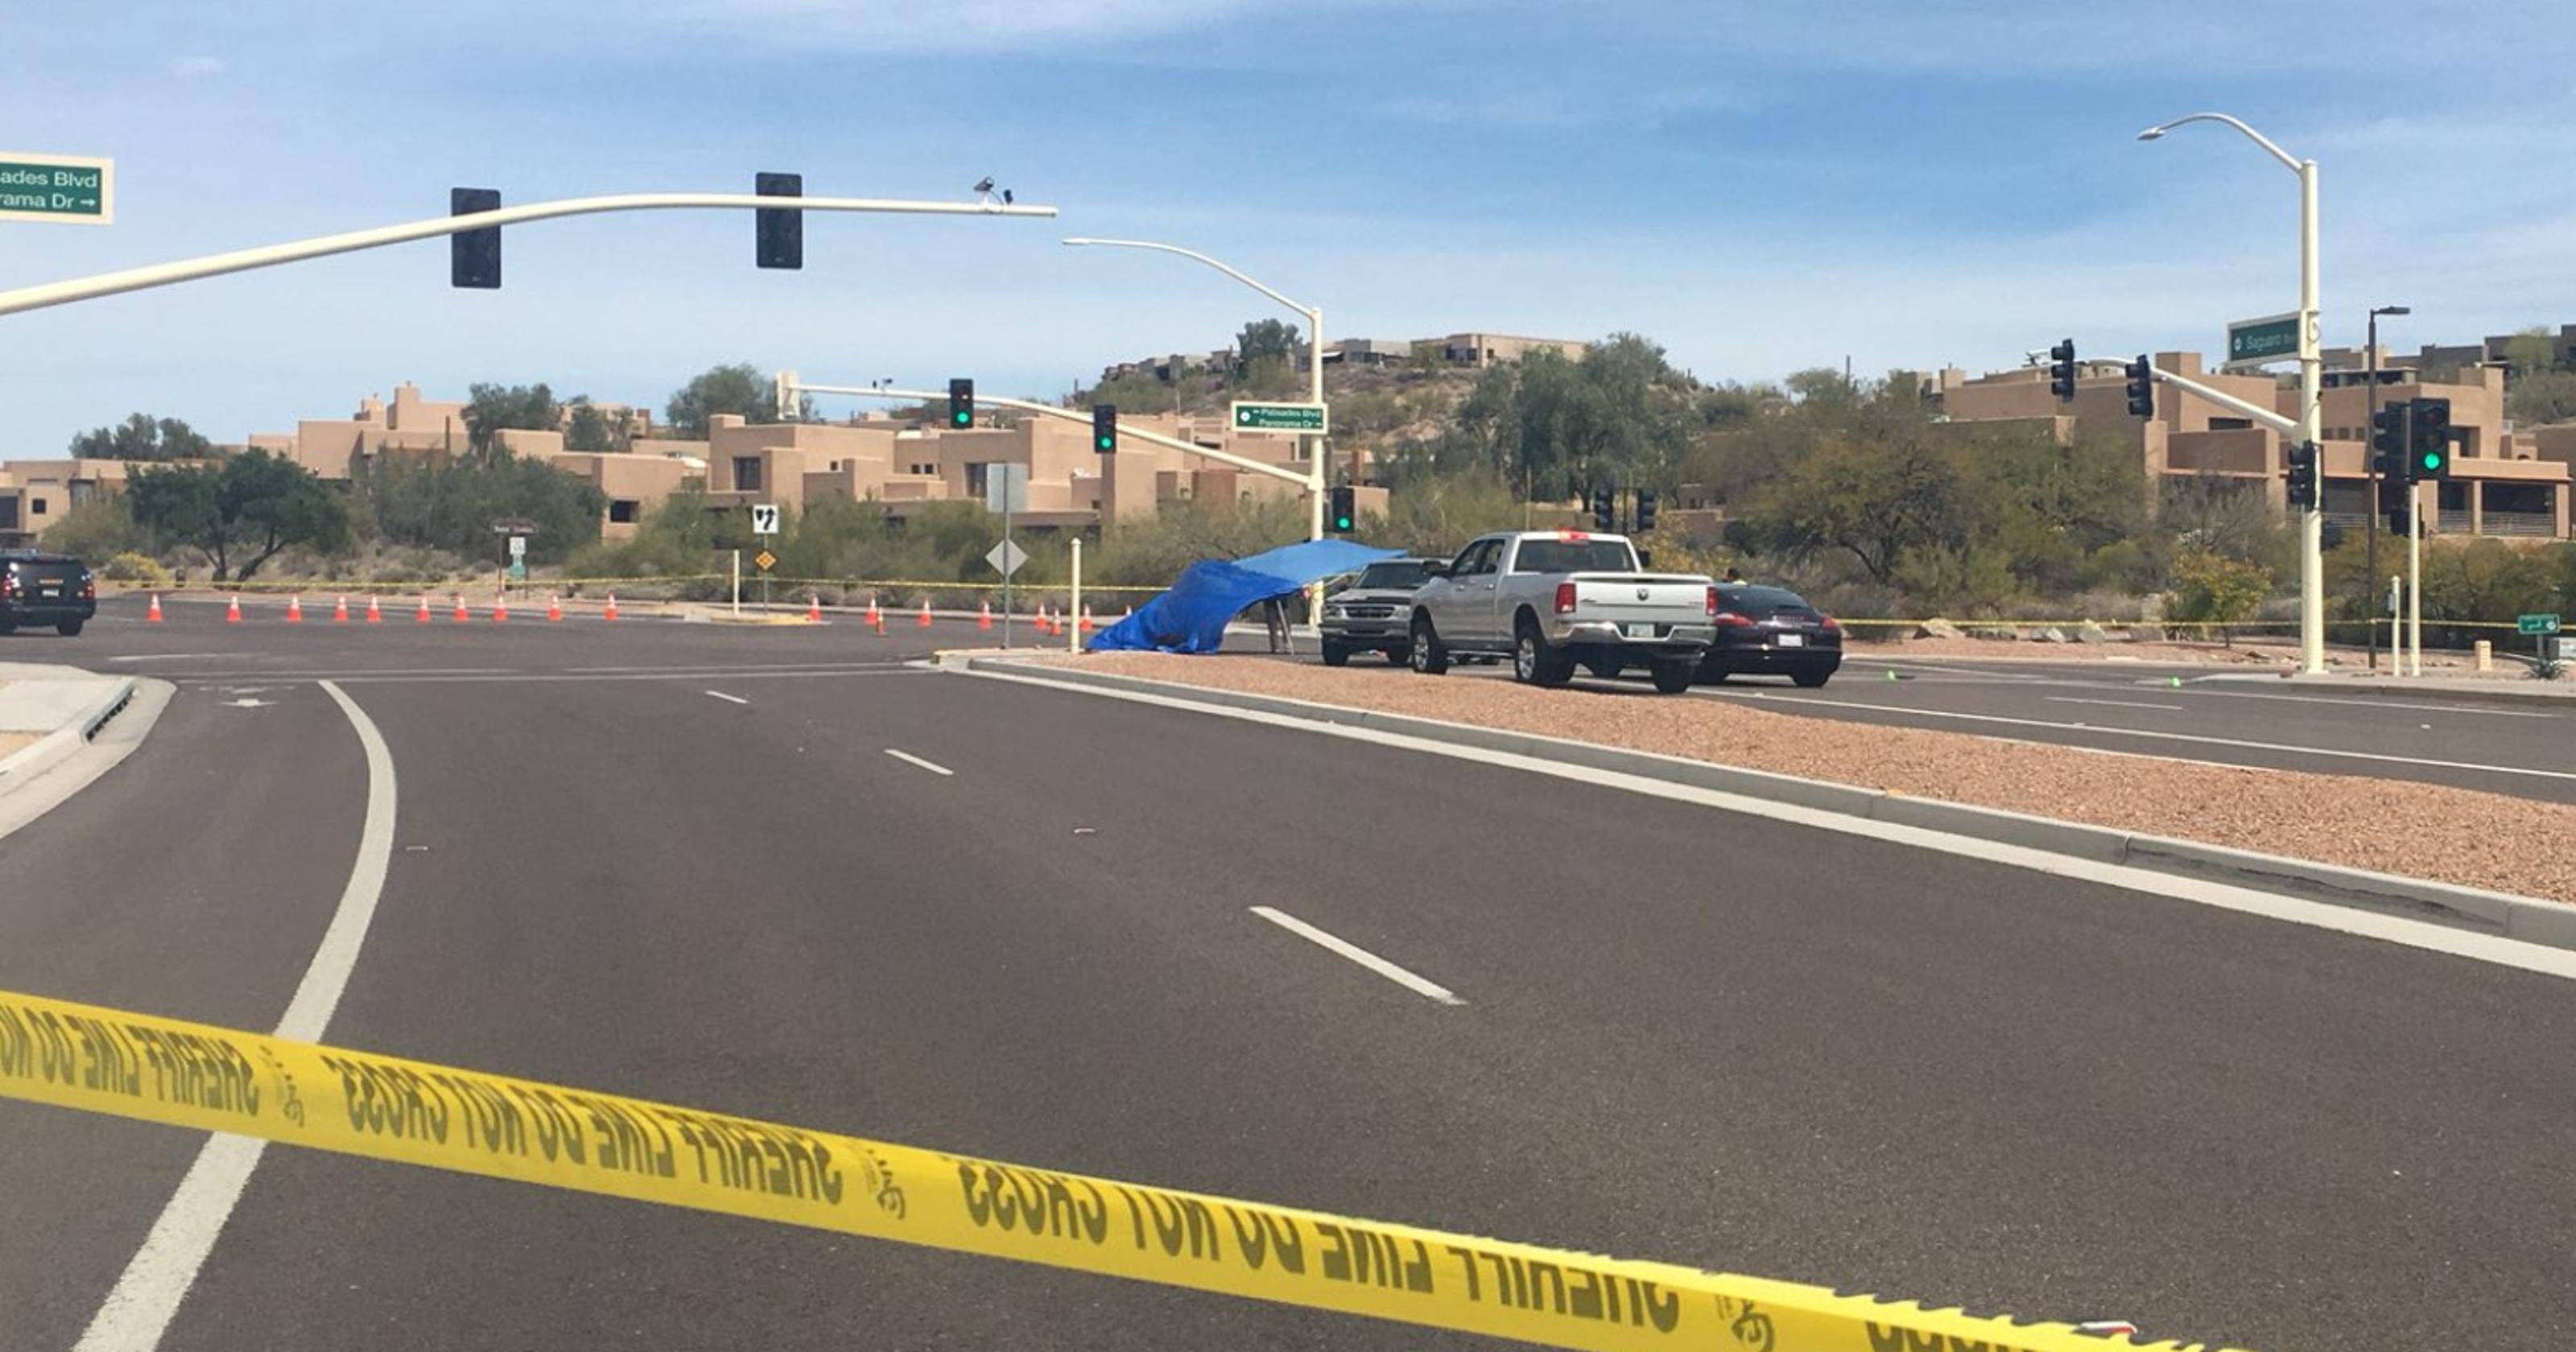 Arizona Official Pedestrian Deaths In Week Shows Major Crisis - Fountain hills car show 2018